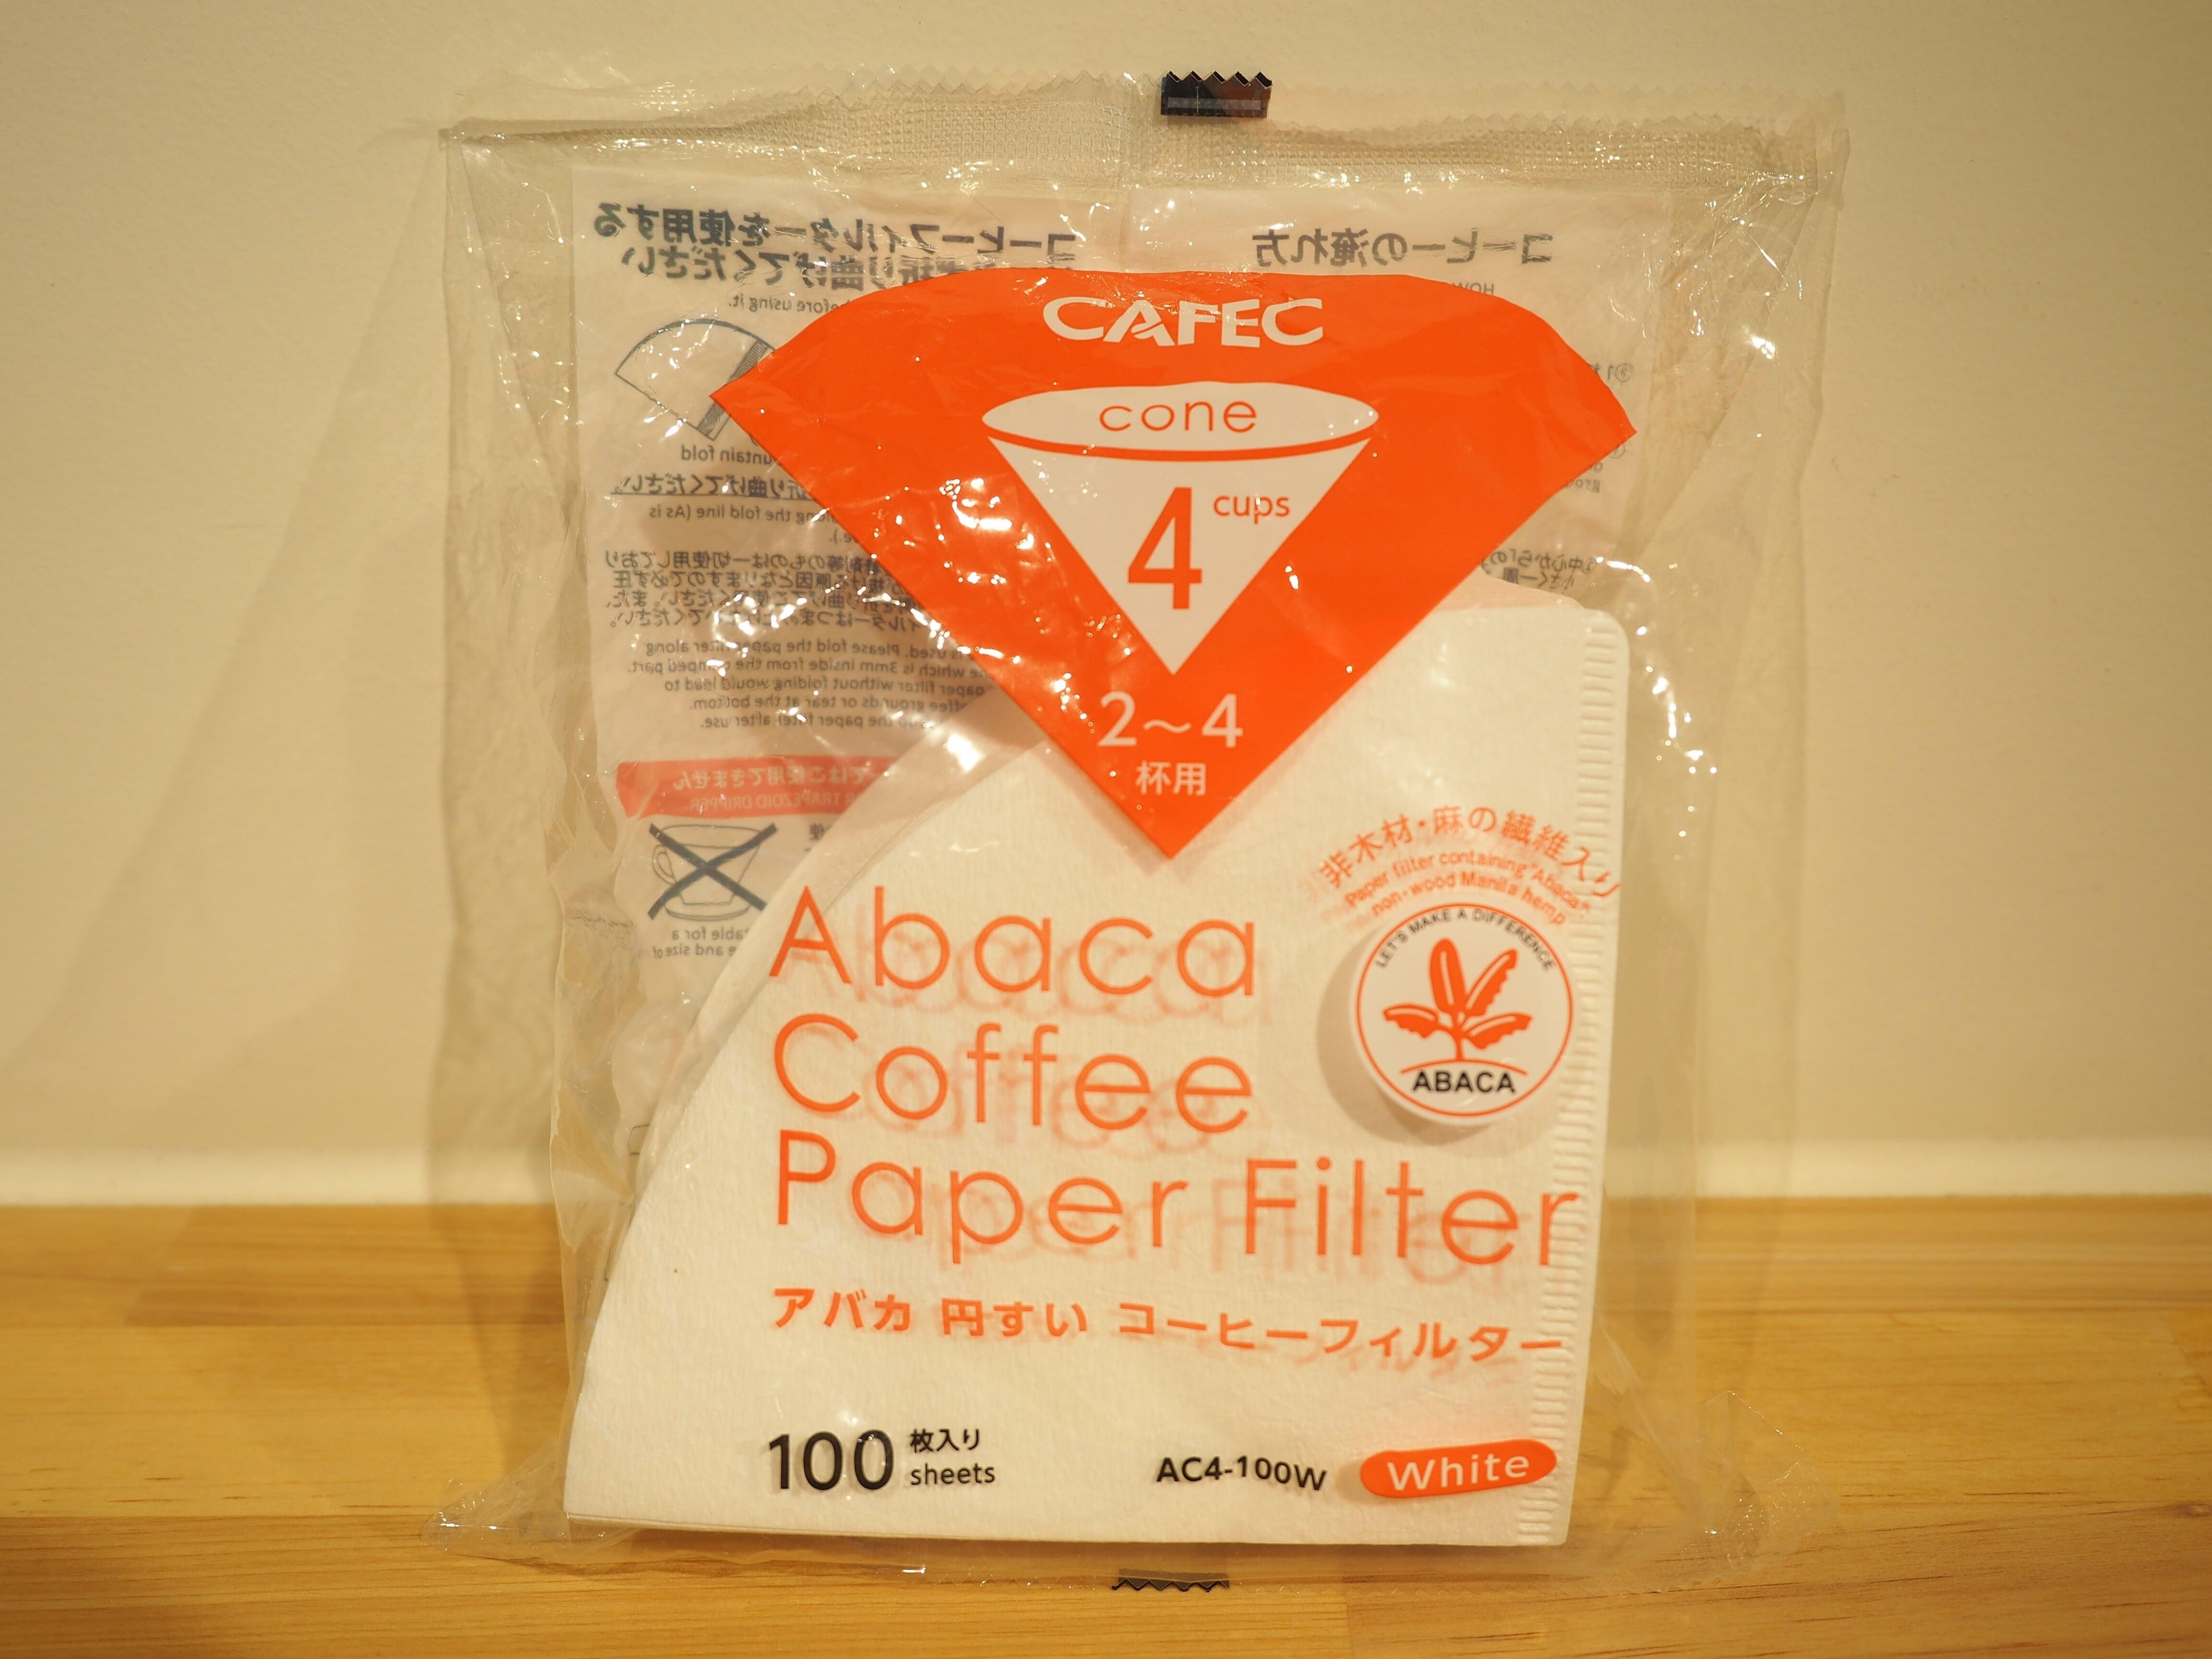 CAFEC アバカ円錐 コーヒーフィルター cup4